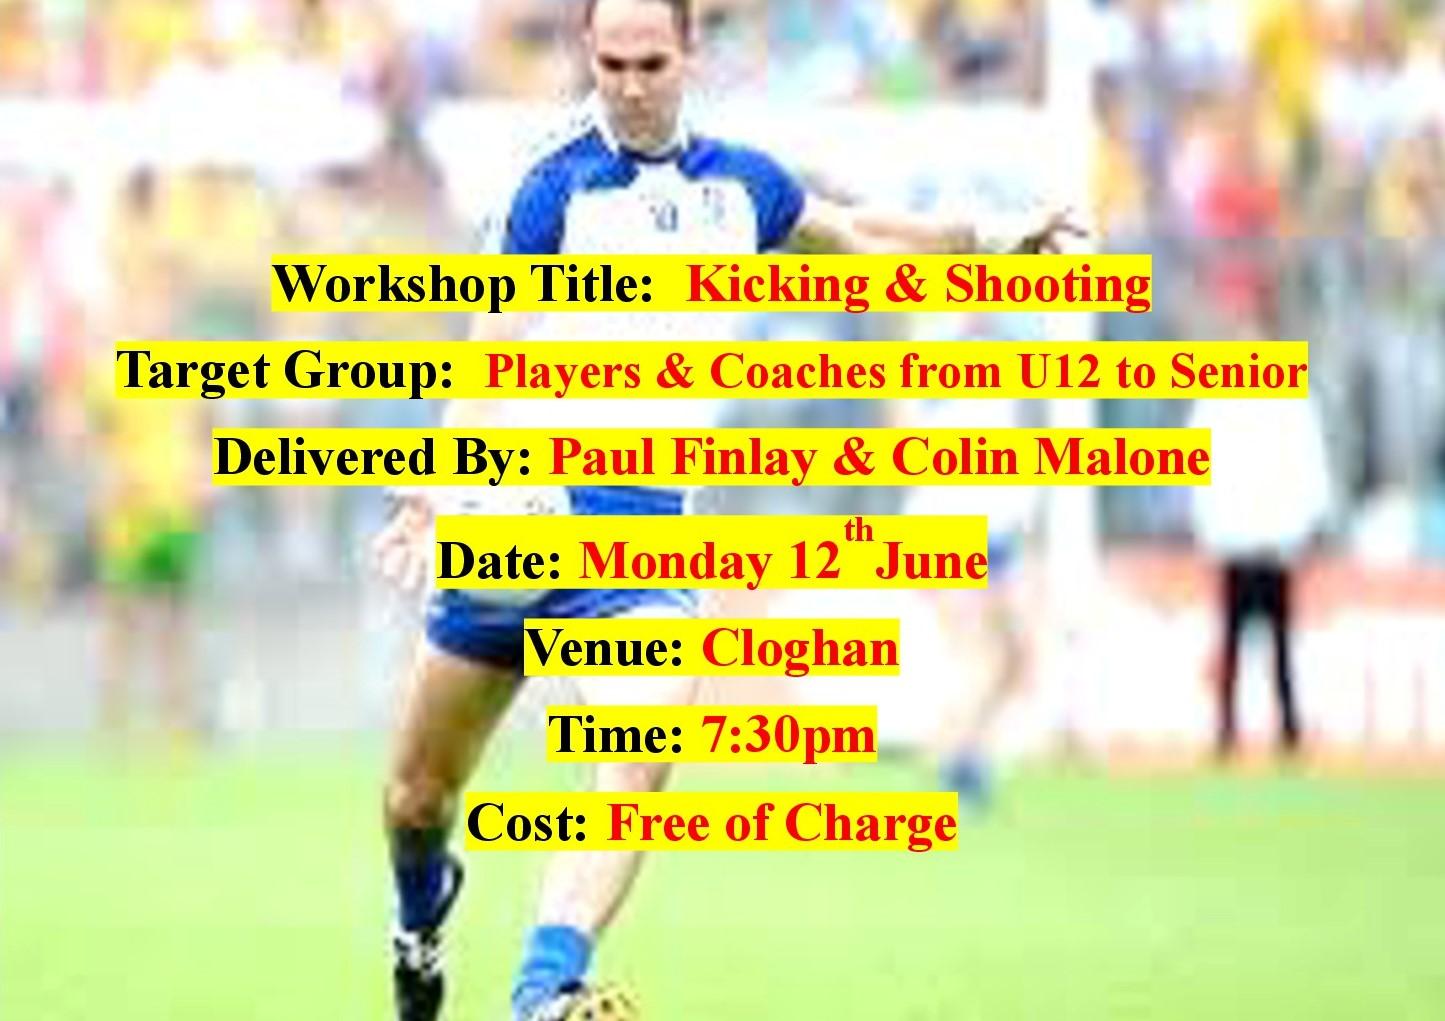 Kicking & Shooting Coaching Workshop- This Monday 12th June @7:30pm Cloghan